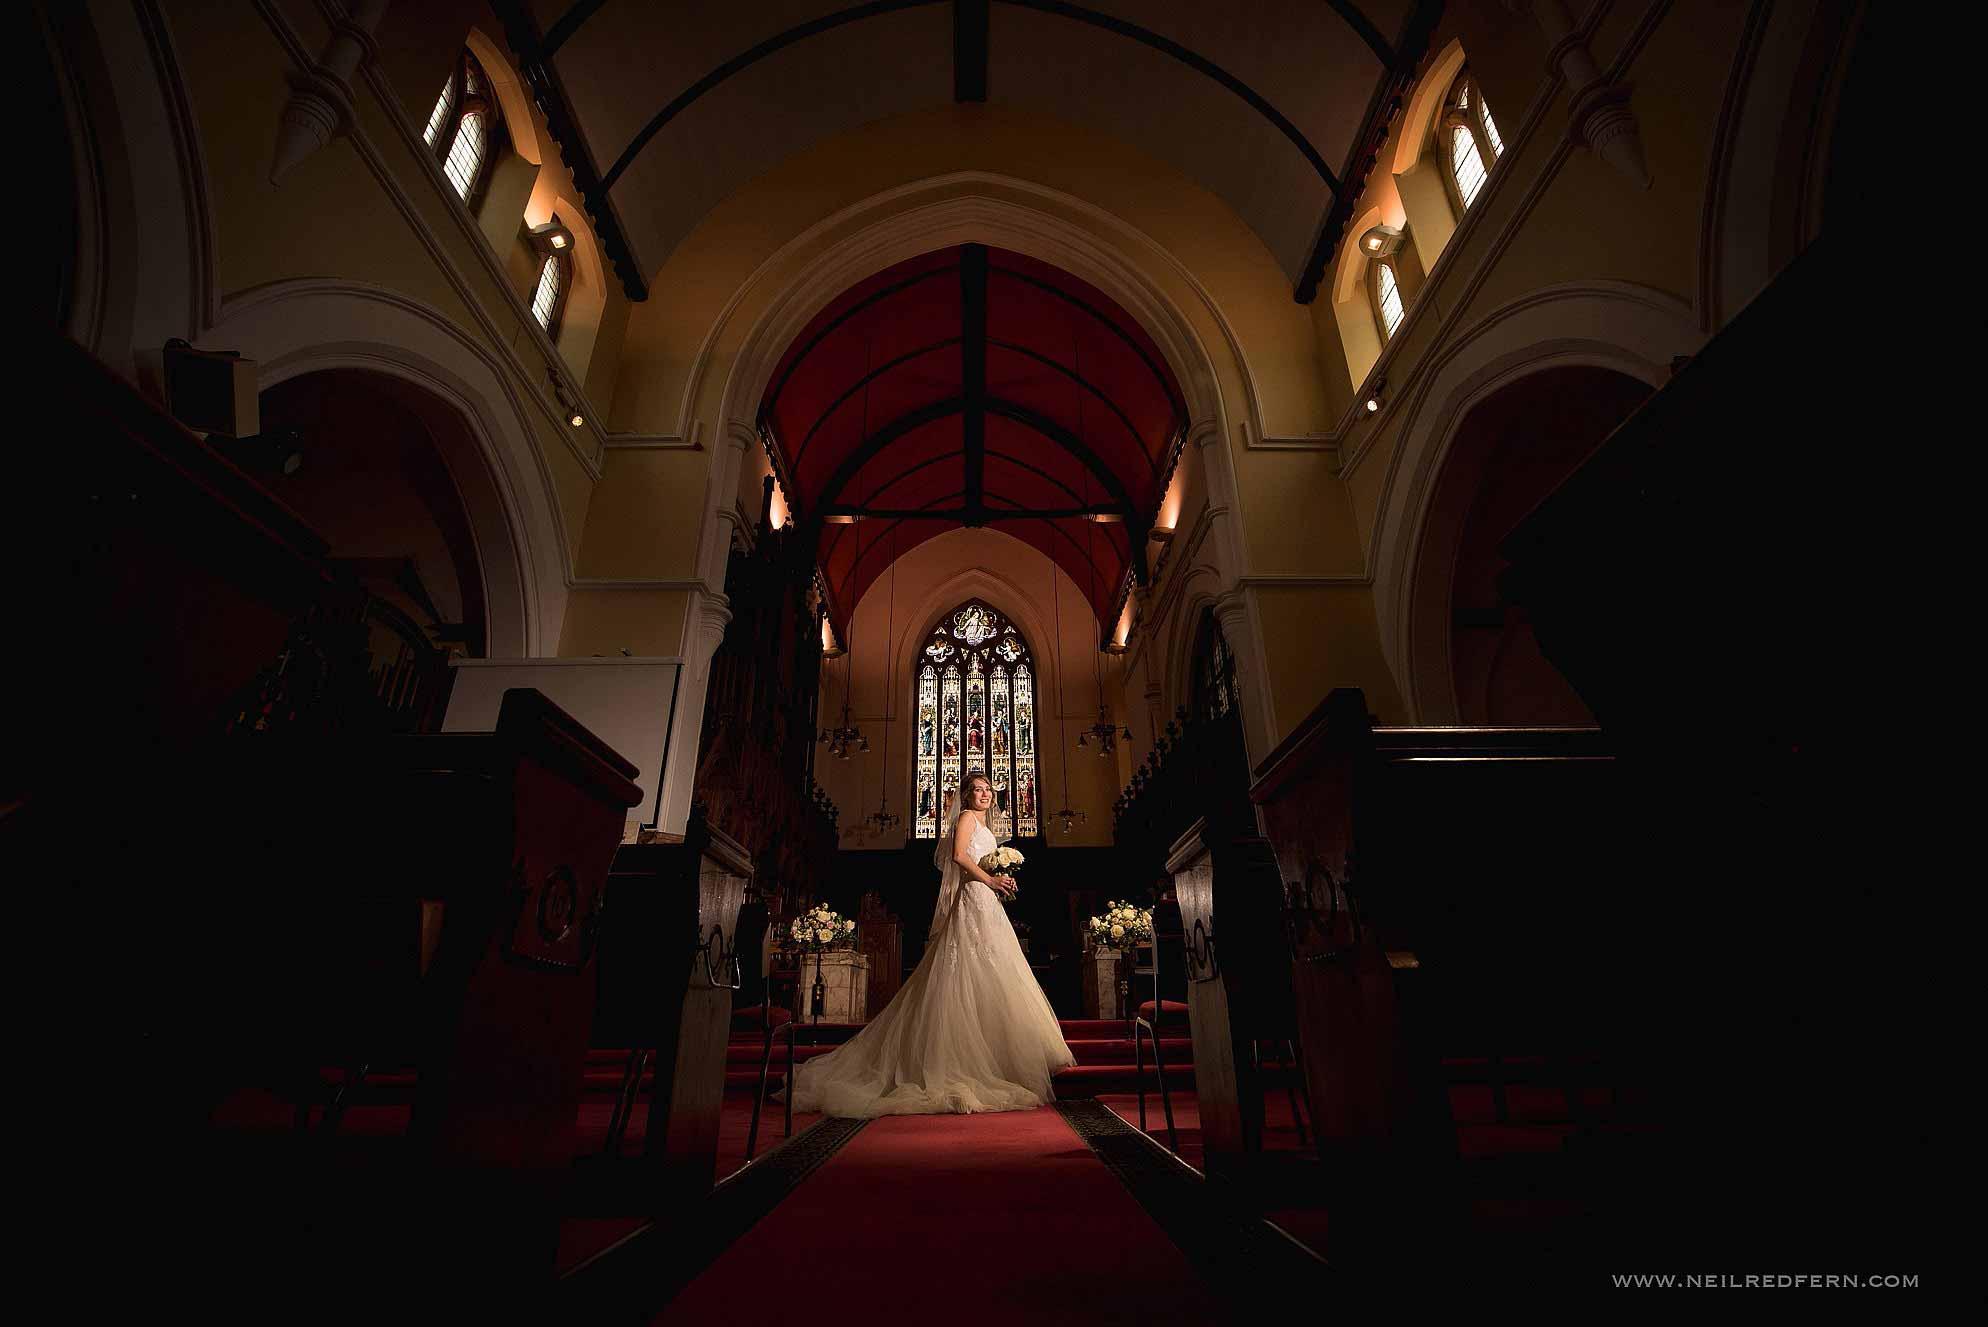 off camera flash photo of bride in church